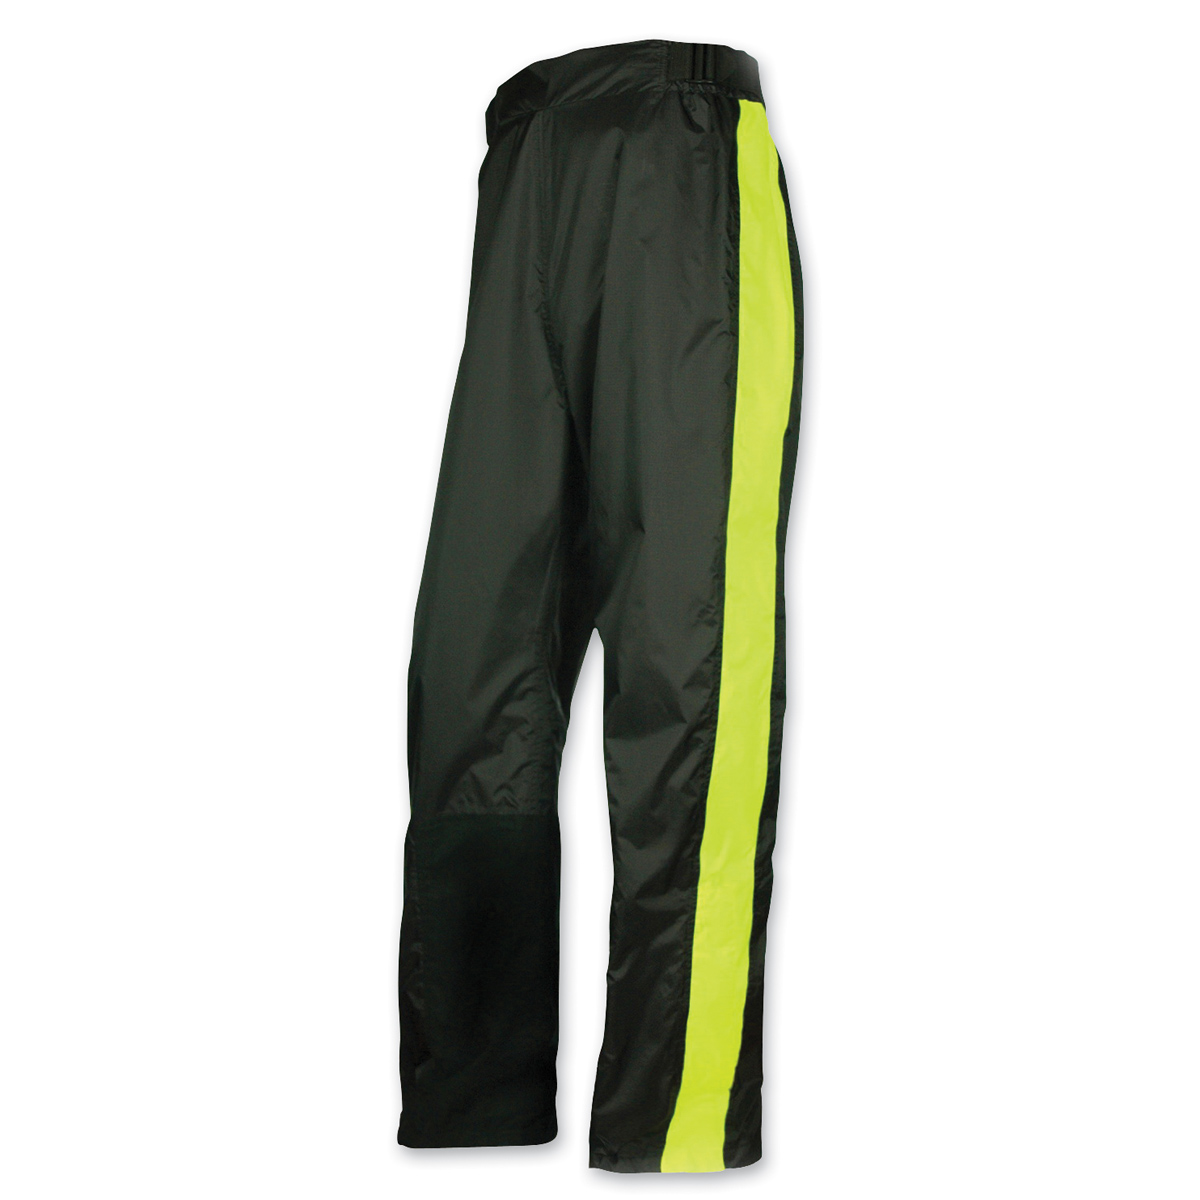 Olympia Moto Sports Unisex Horizon Neon Yellow/Black Rain Pant